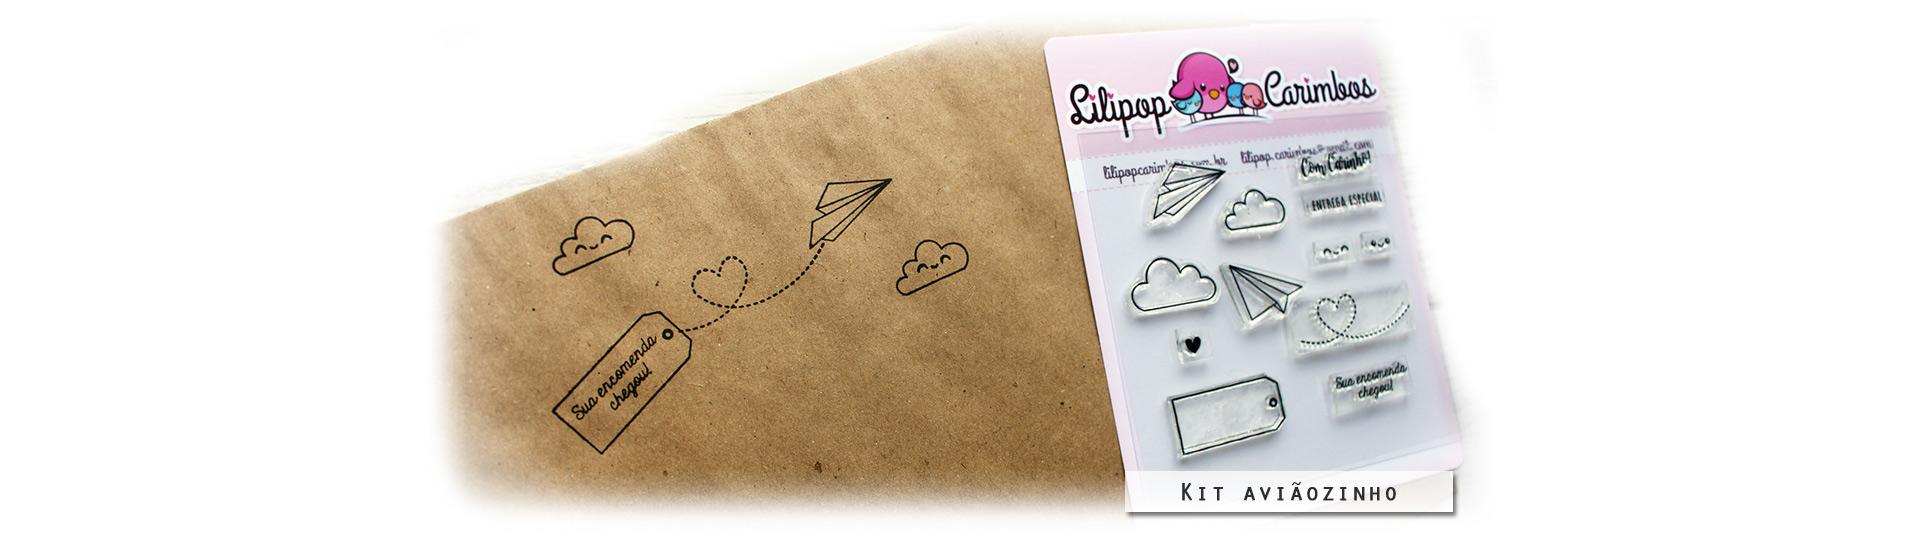 http://www.lilipopcarimbos.com.br/carimbos/kit-de-carimbos-aviaozinho